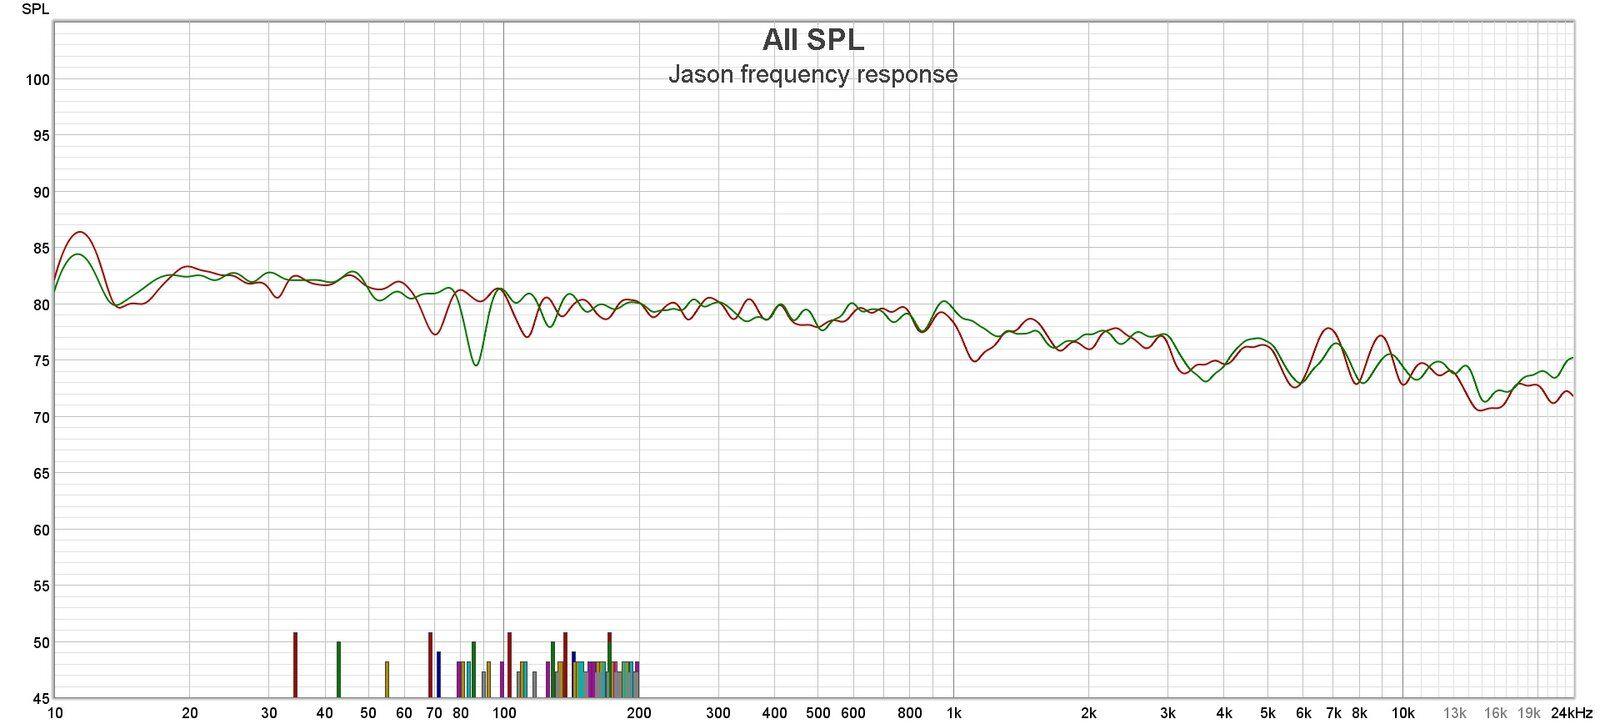 Jason frequency response.jpg